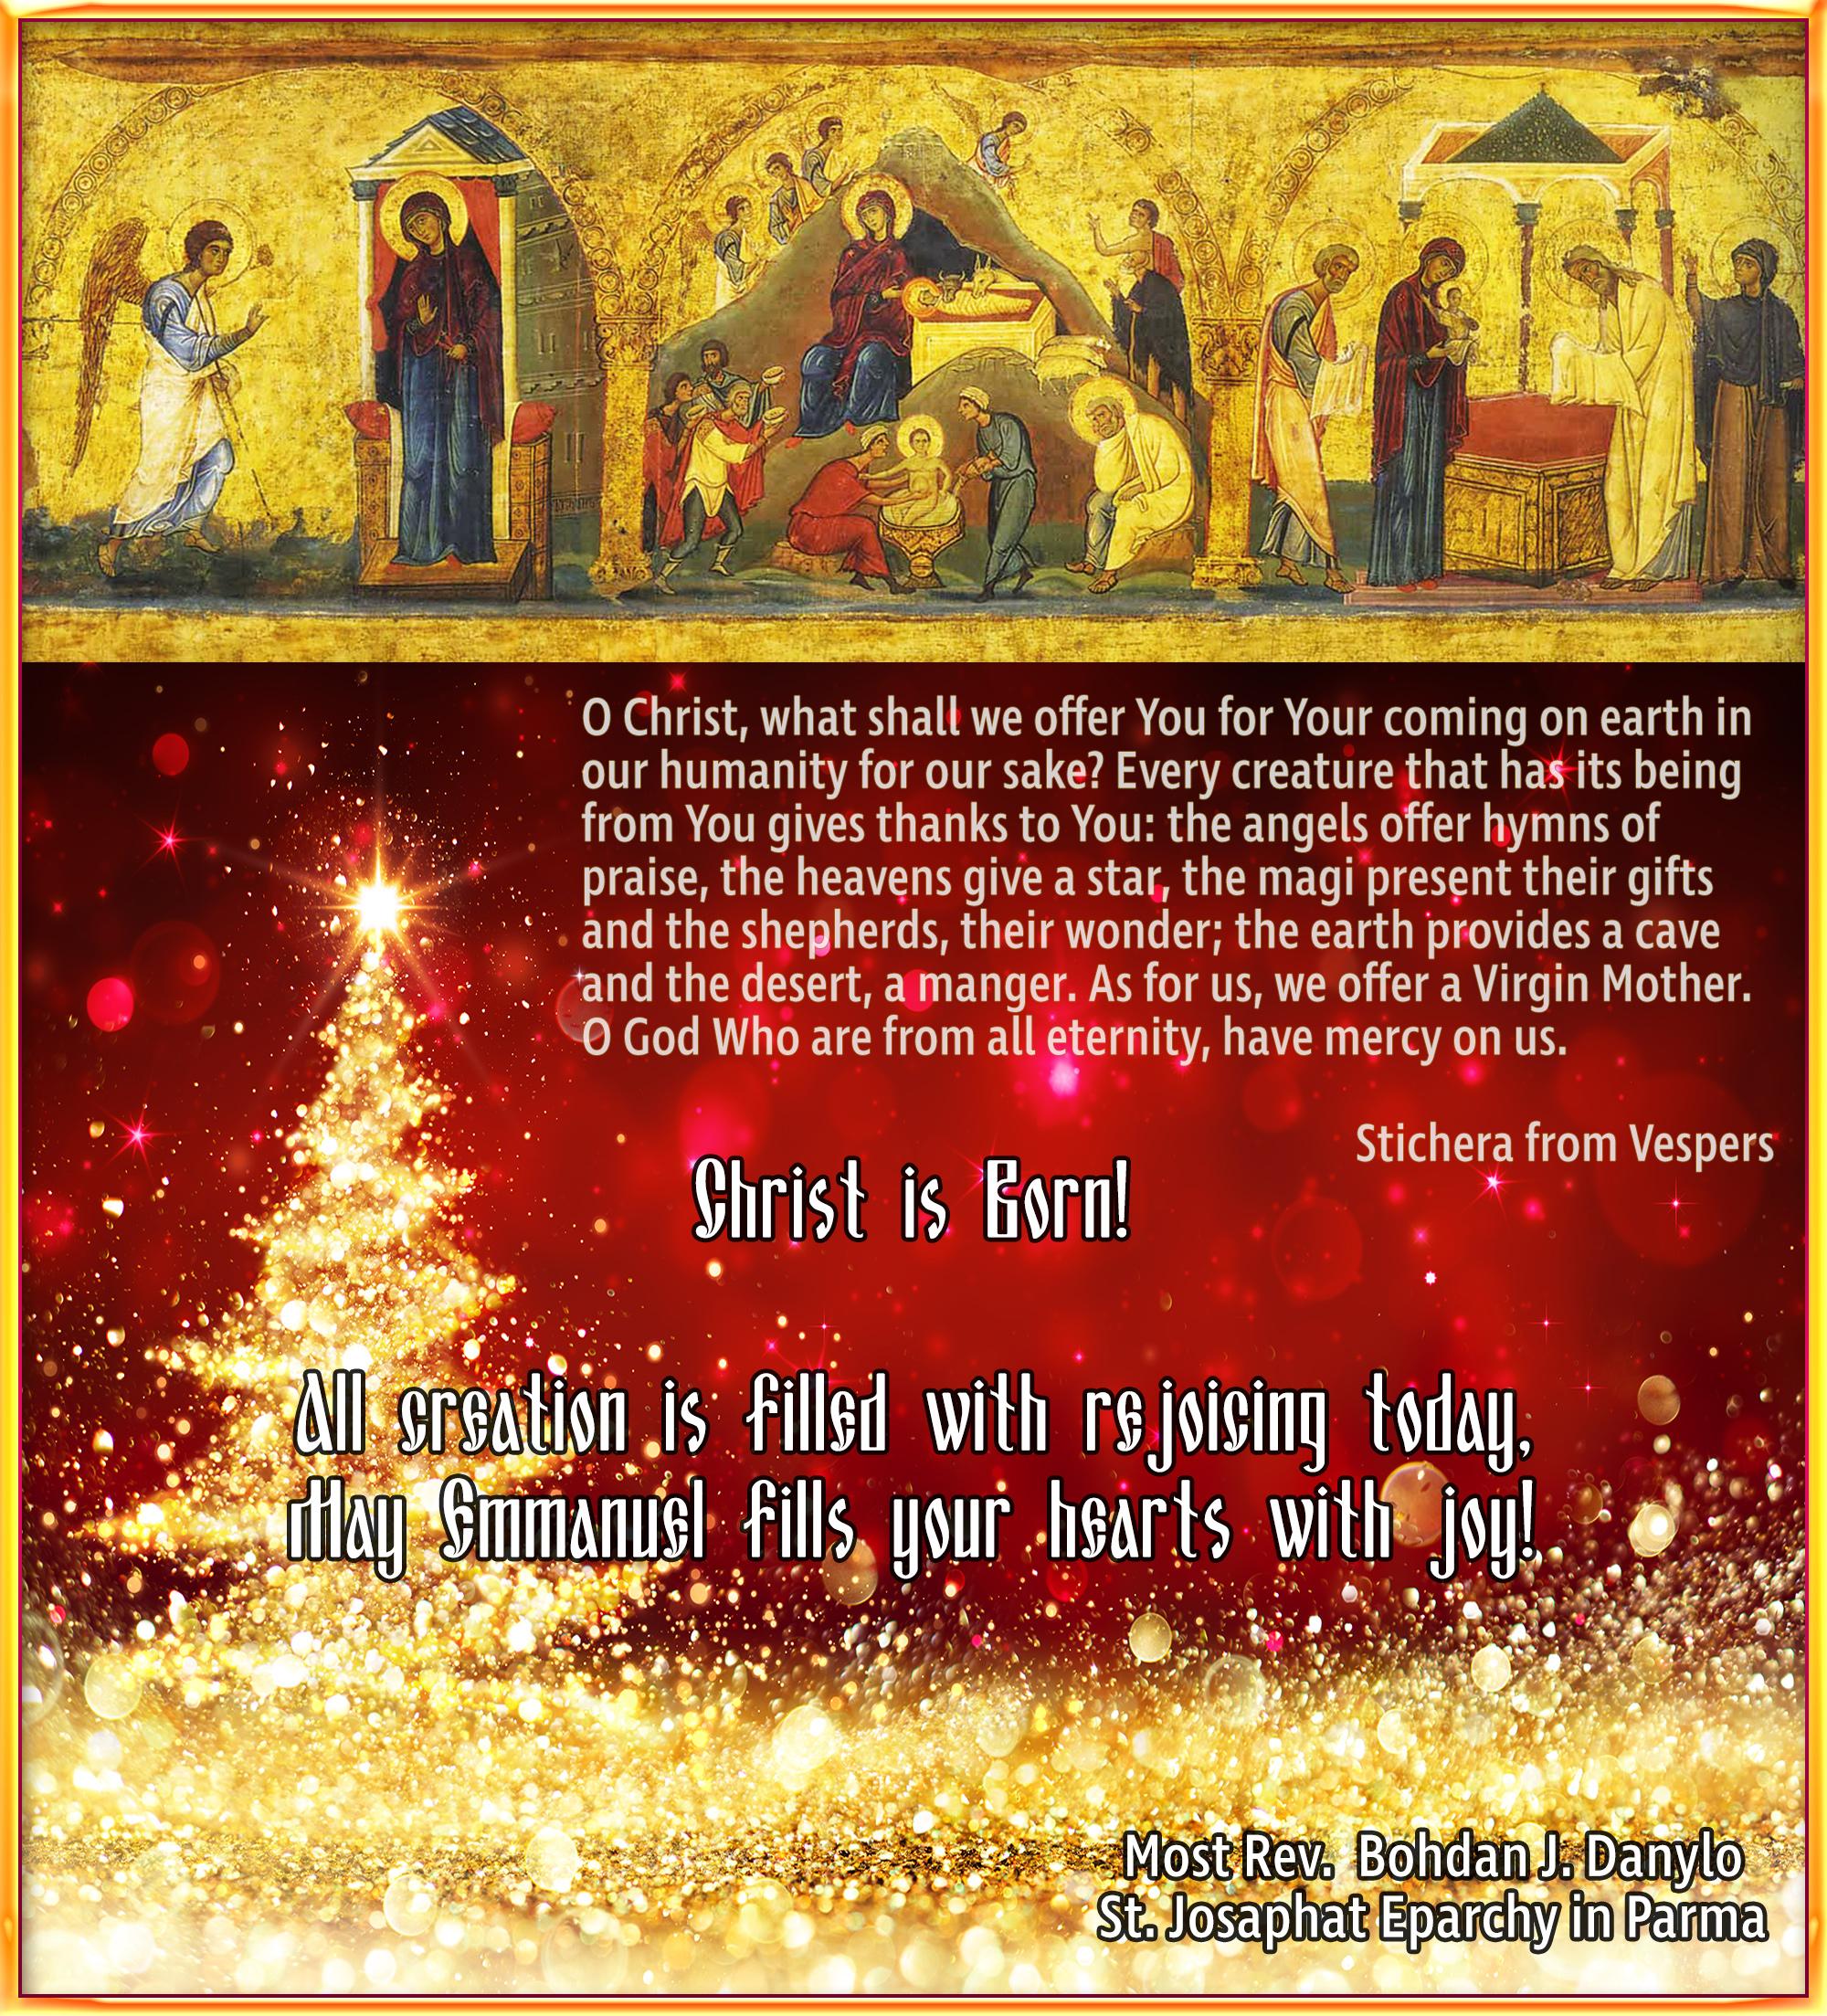 Christmas Greetings St Josaphat Eparchy